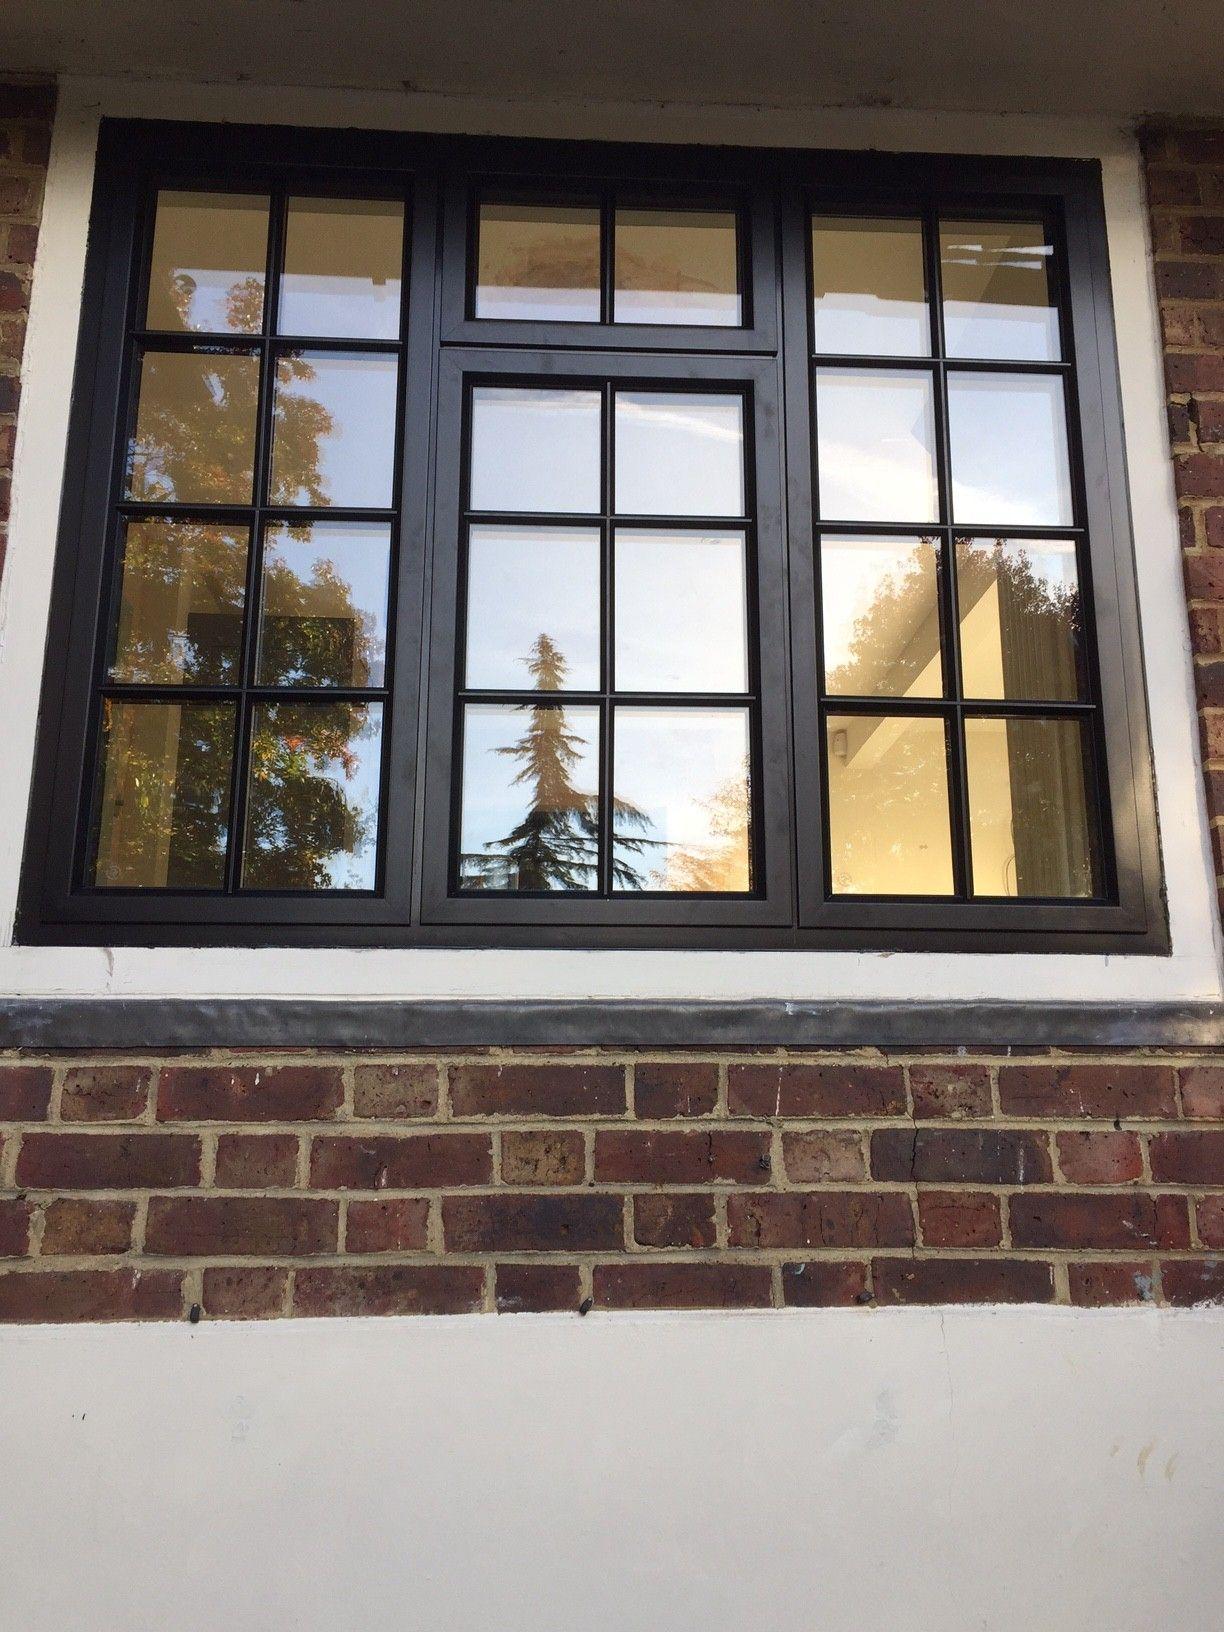 40 Minimalist Window Design Ideas For Your House Images Window Design Wooden Window Design Casement Windows Exterior